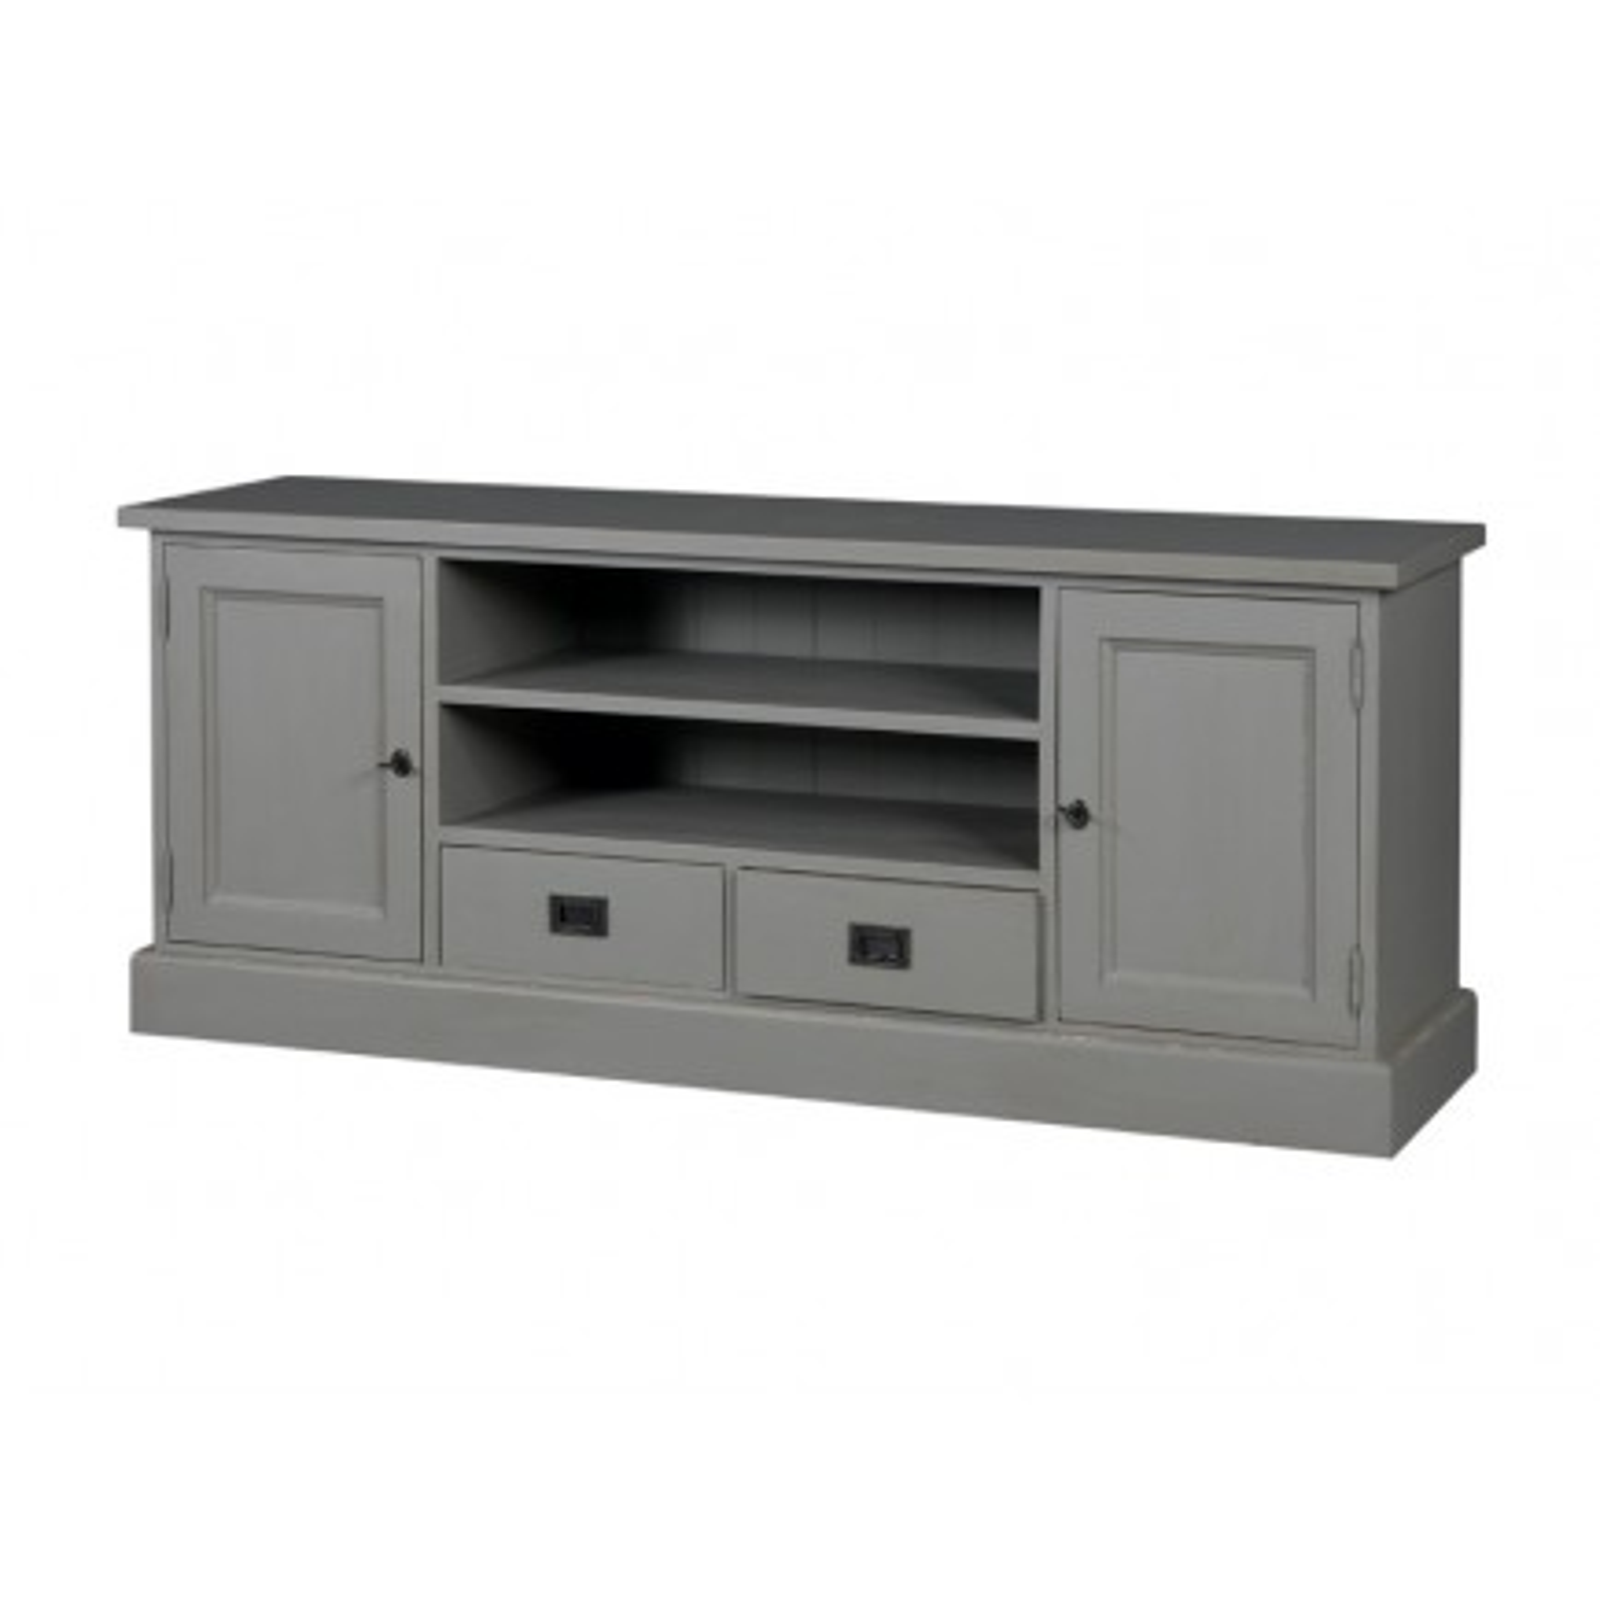 Meuble Tv Tosca Pin - mobilier style classique